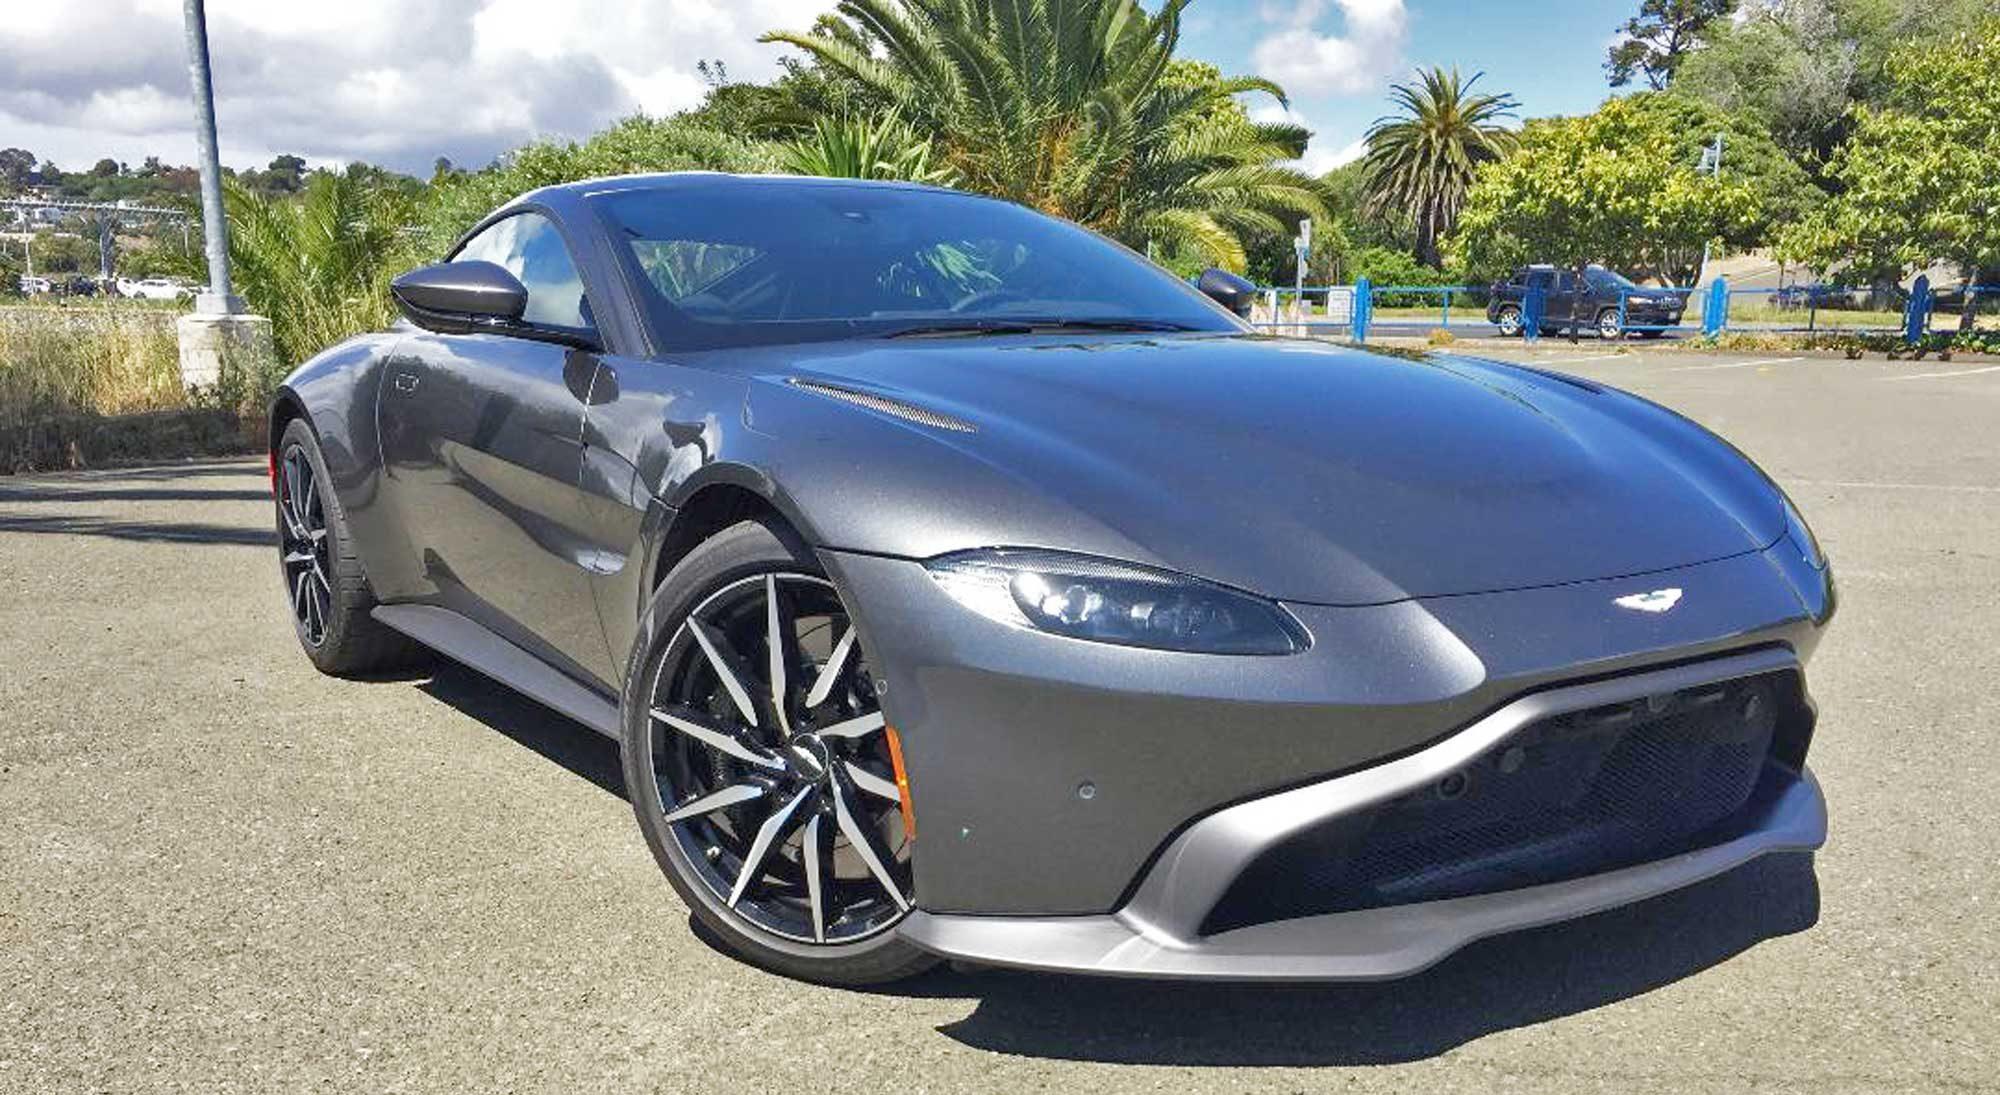 2020 Aston Martin Vantage Coupe Test Drivenbsp